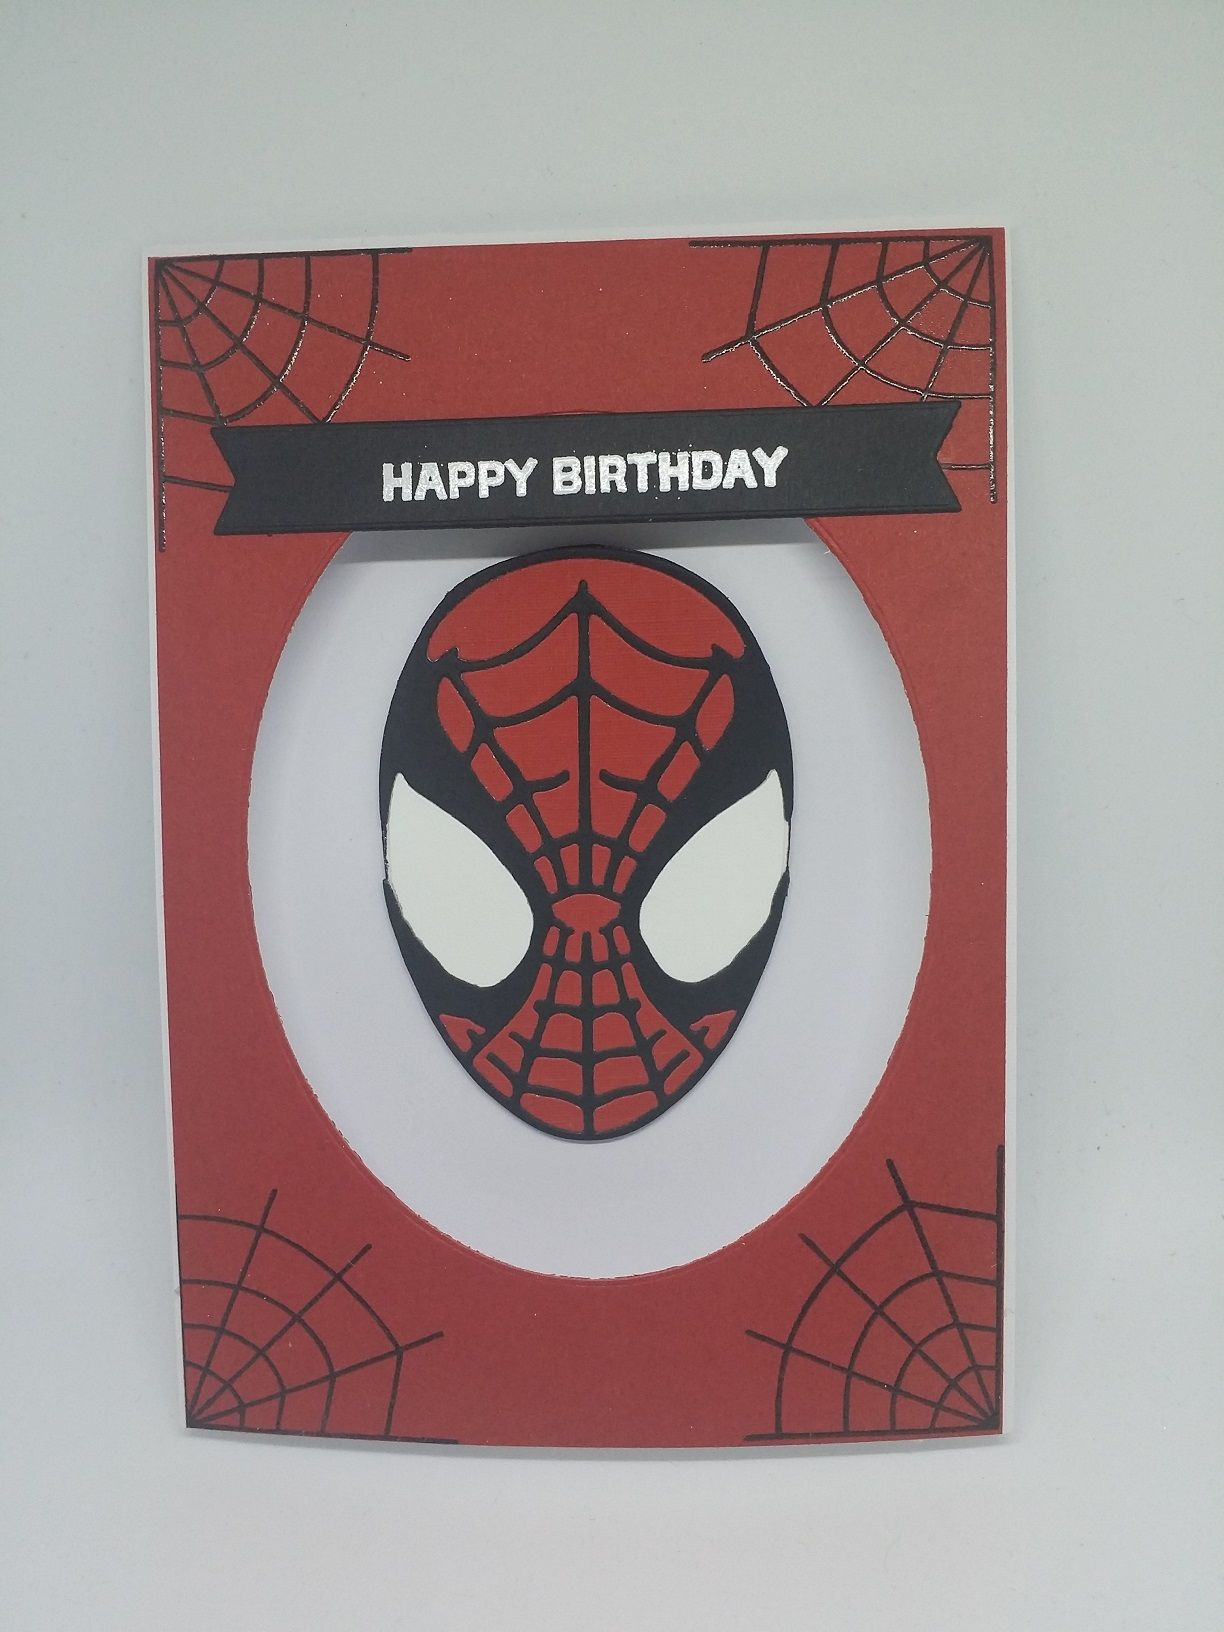 Spiderman Birthday Card Spiderman Cards Birthday Card Drawing Spiderman Gifts